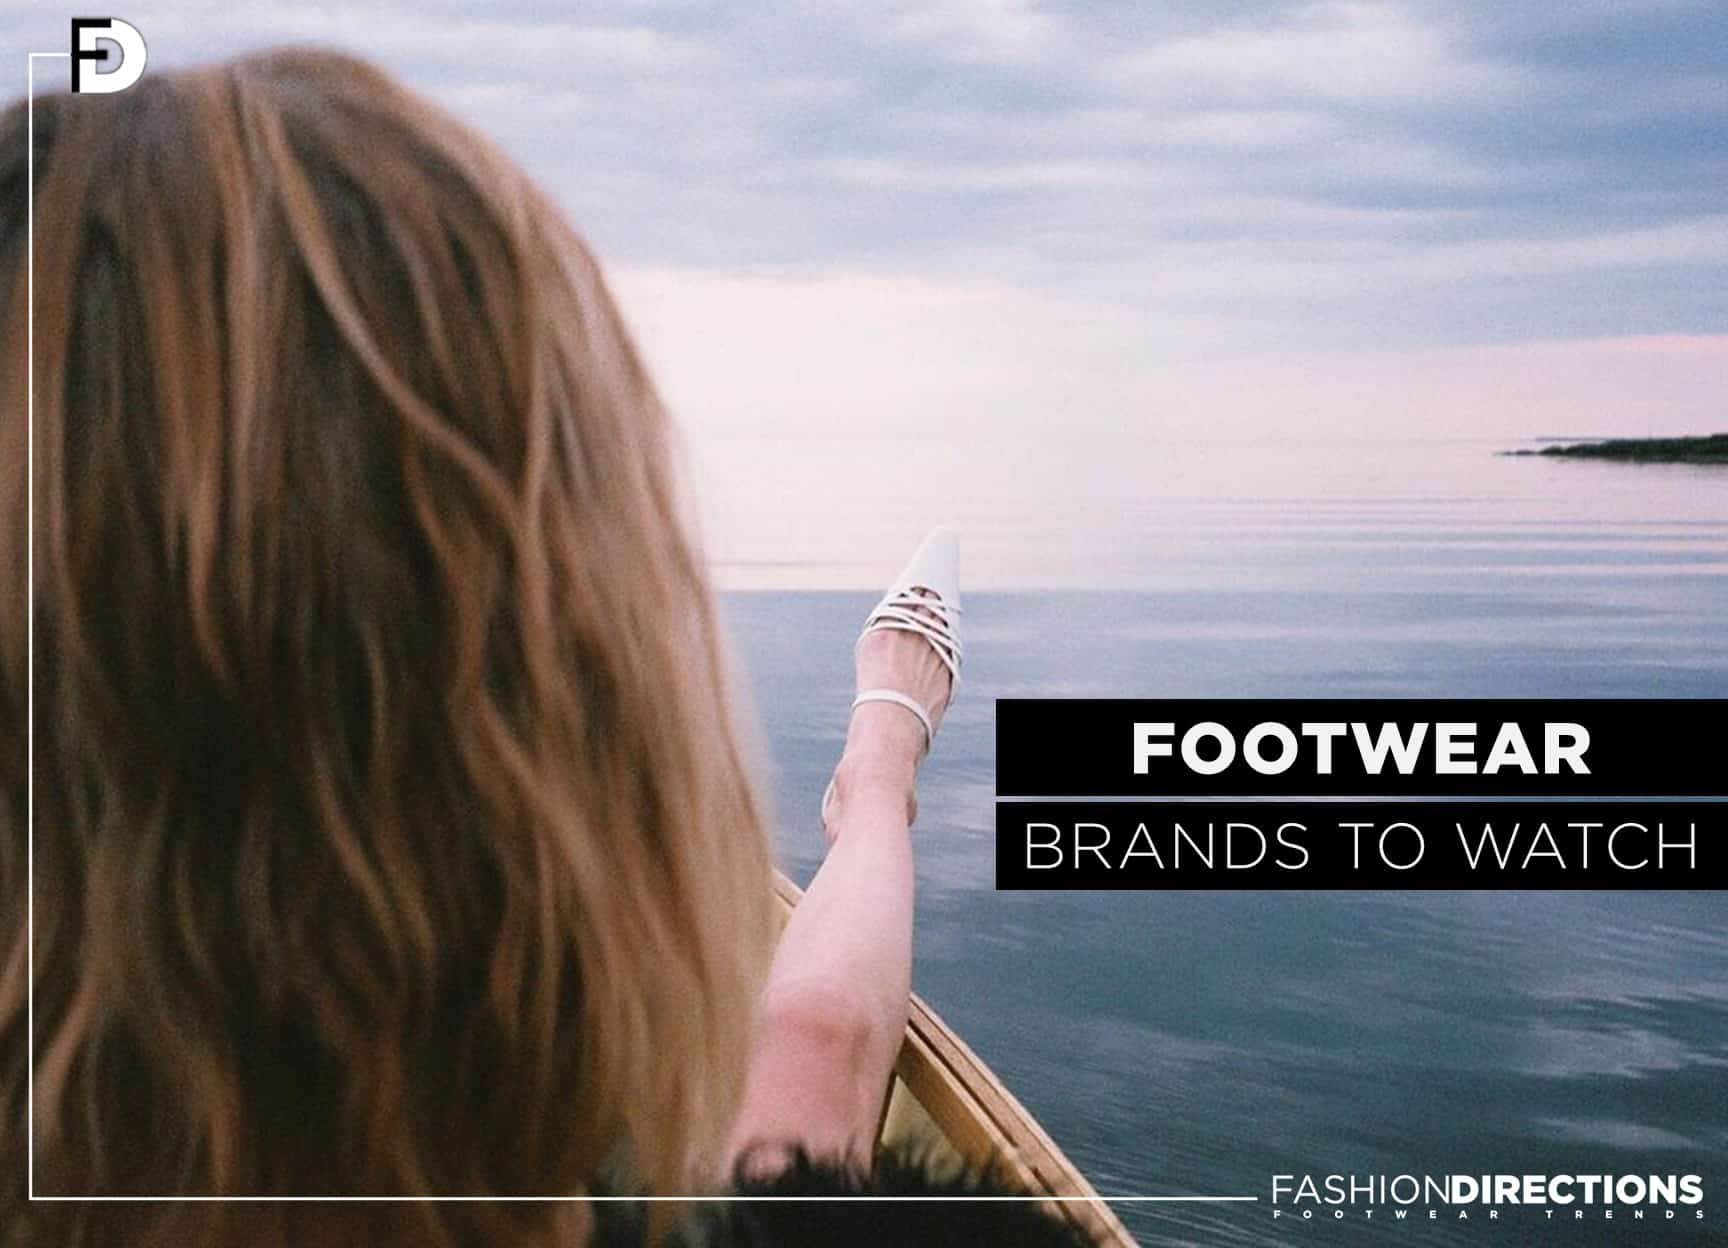 New Footwear Brands 54